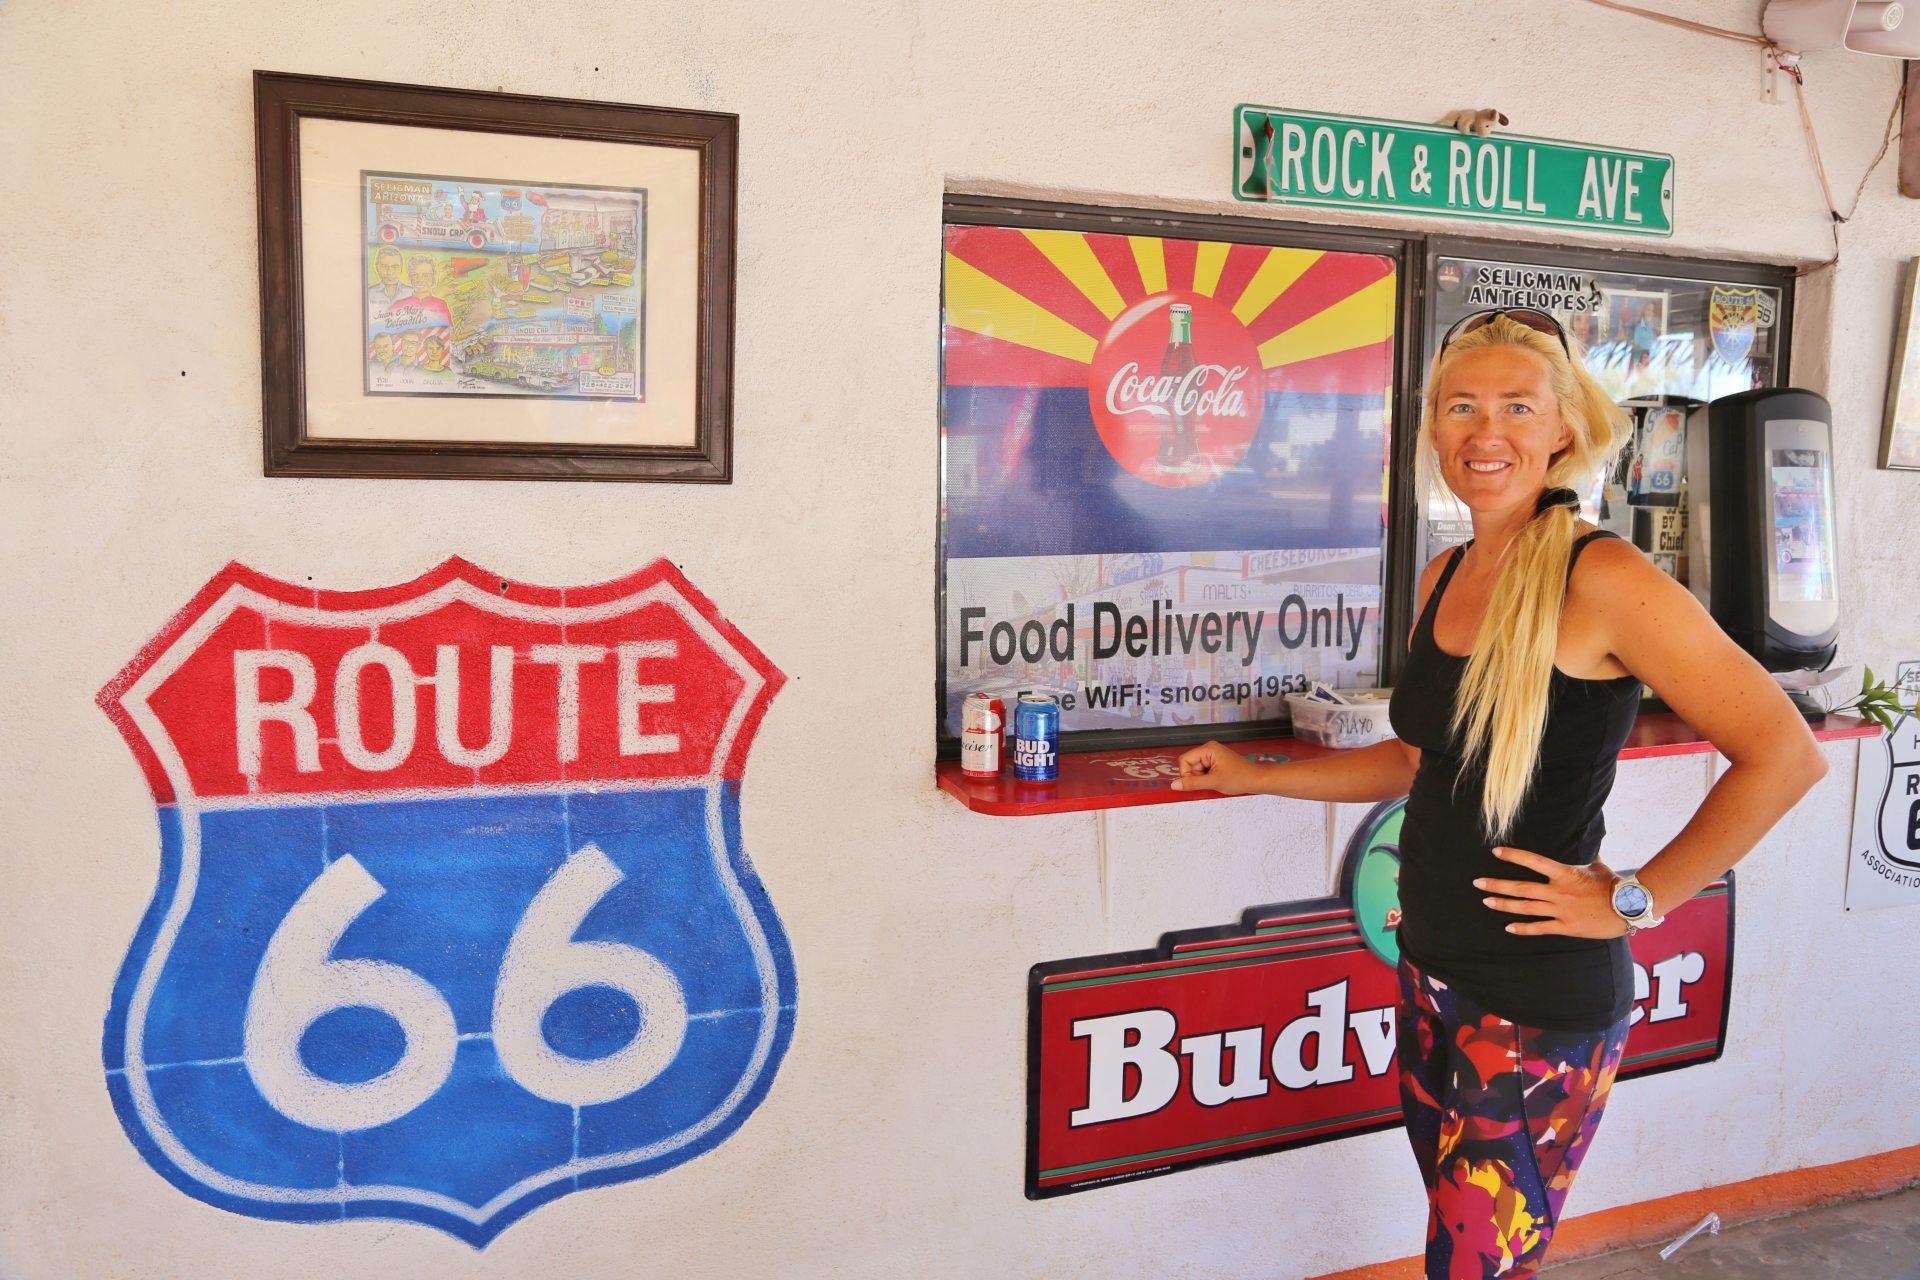 Her mit meinem Hotdog, pronto! - Arizona, Blondine, Burgers, Delgadillos Snow Cap, Drive-In, Personen, Portrait, Porträt, Restaurant, Route 66, Schilder, Seligman, Tafel - HOFBAUER-HOFMANN Sofia - (Seligman, Arizona, Vereinigte Staaten)